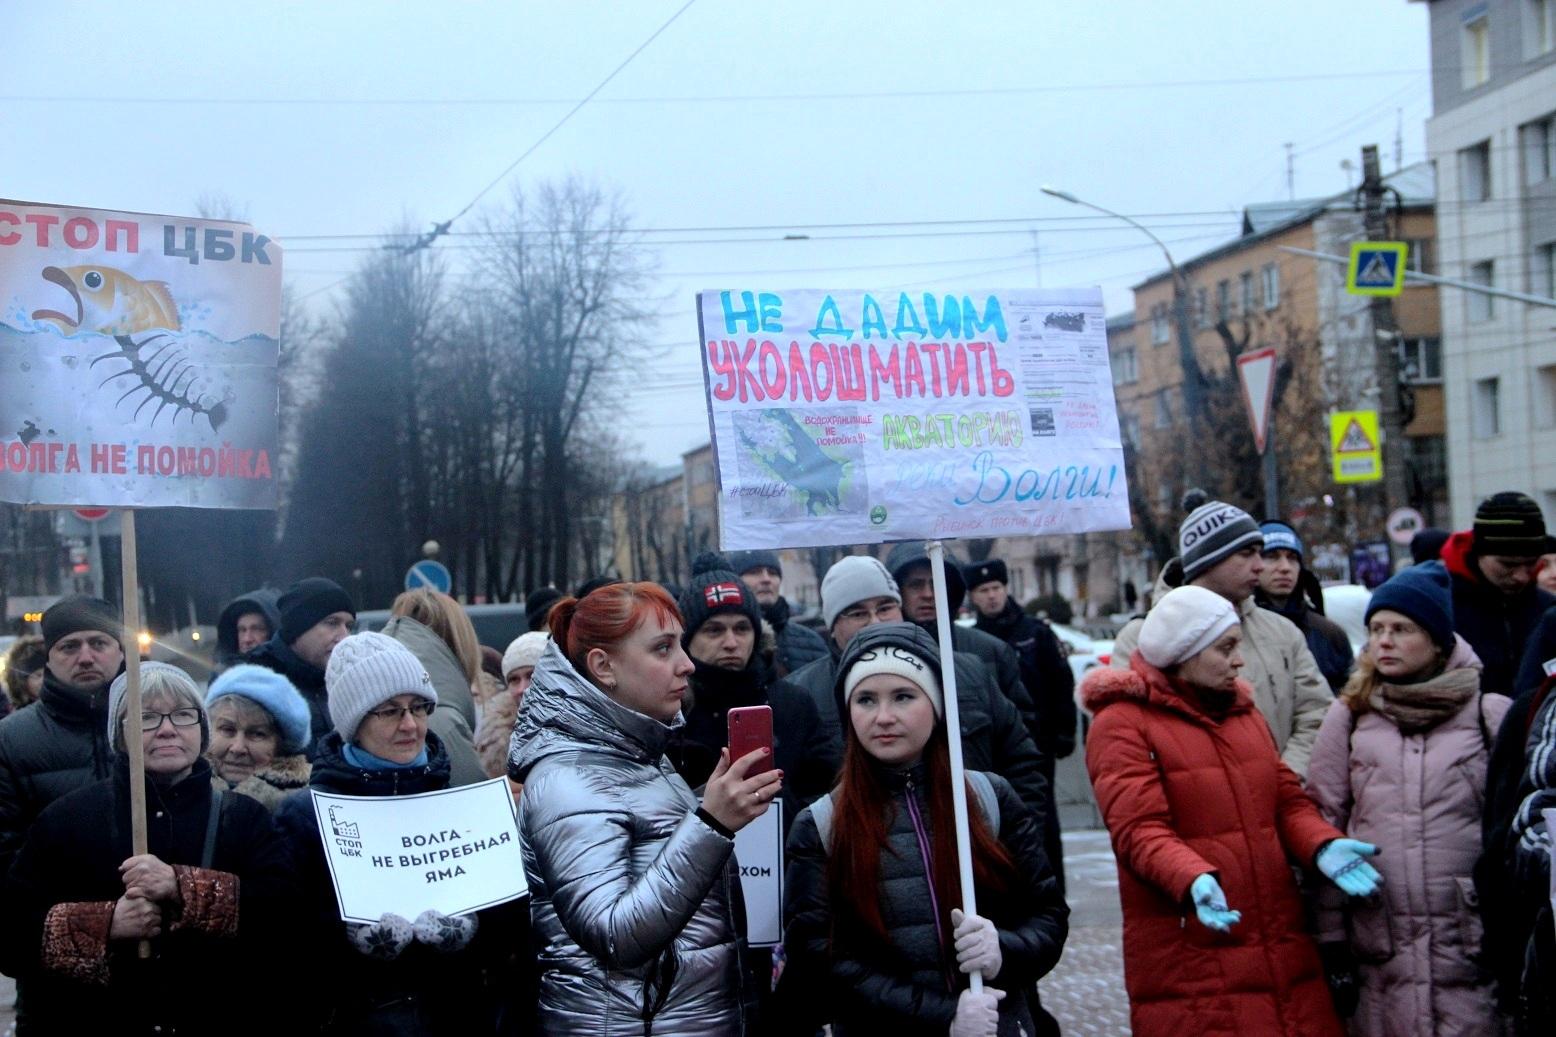 На проспекте Ленина в Ярославле молодежь голосовала против ЦБК (фоторепортаж)